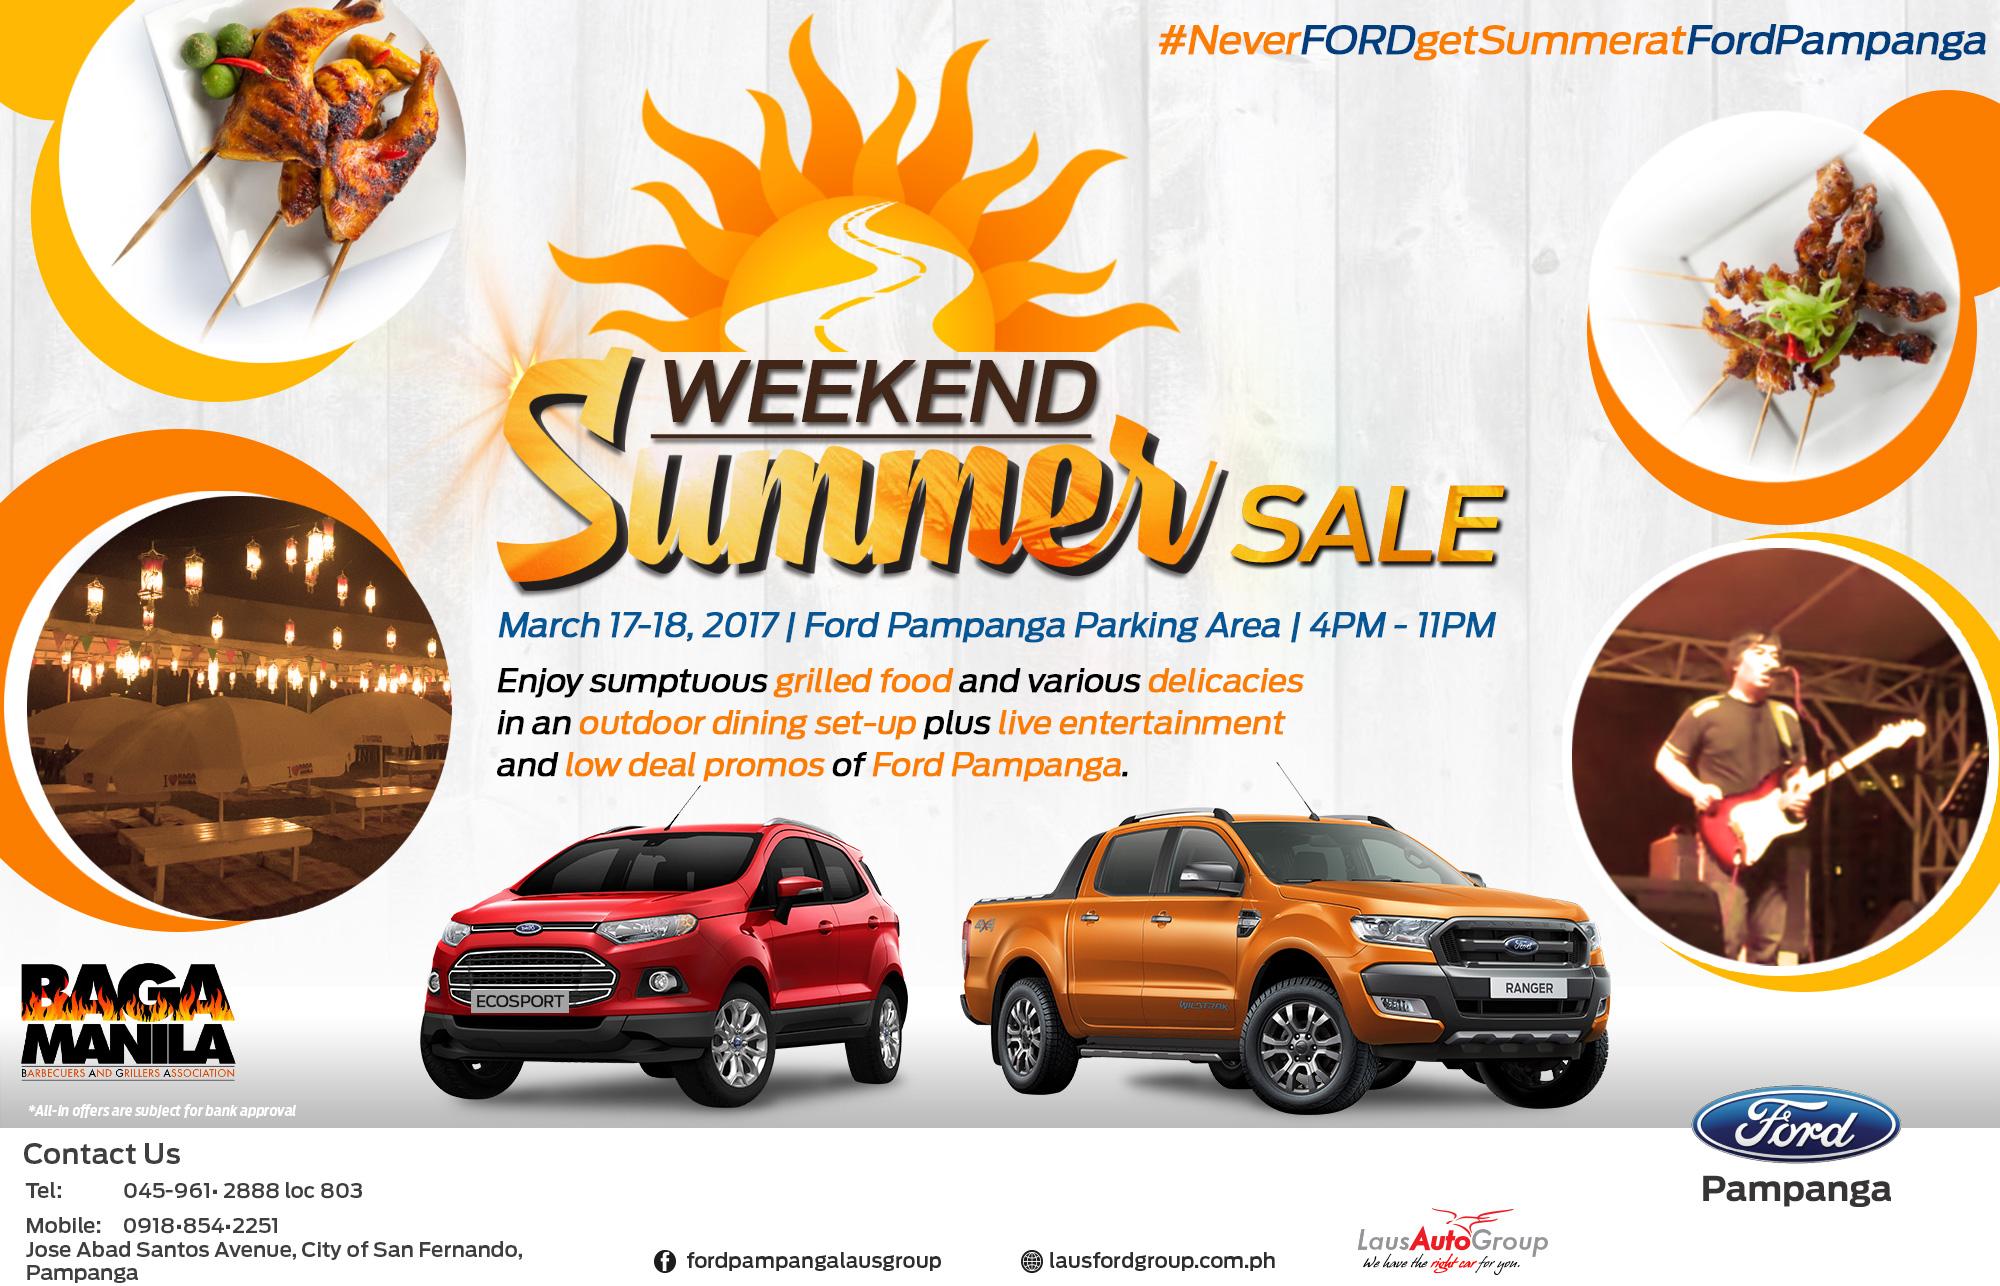 Ford Pampanga Weekend Summer Sale